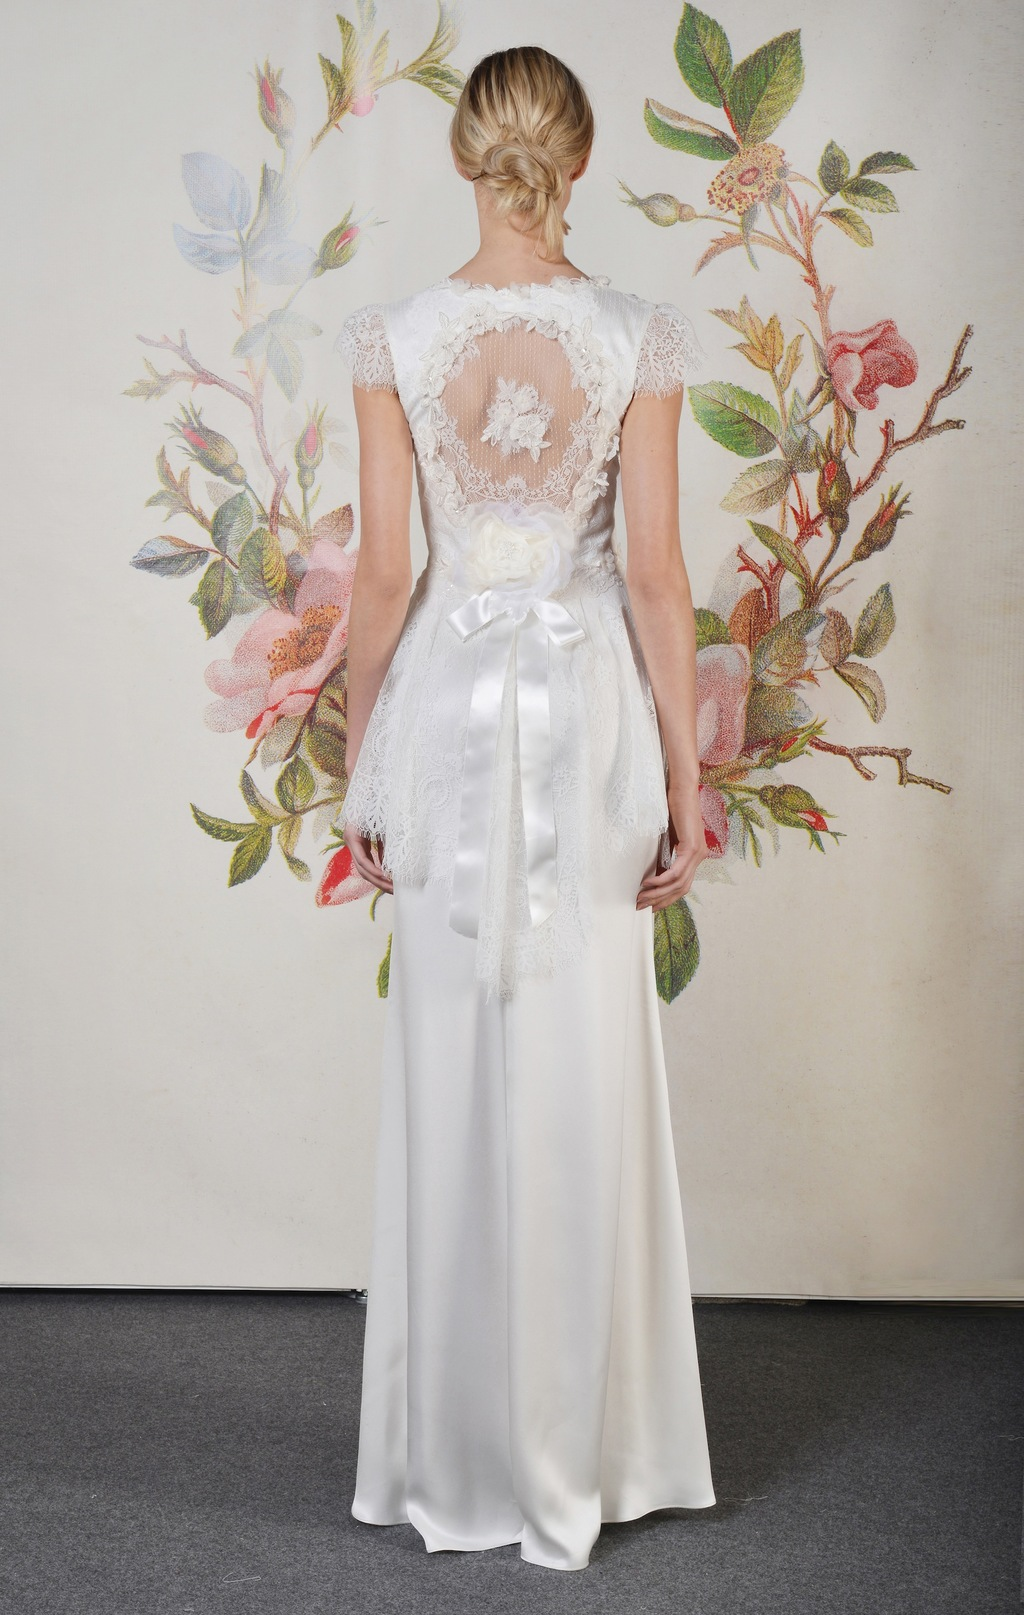 Claire-pettibone-spring-summer-2014-wedding-dress-gladys_b_01.full